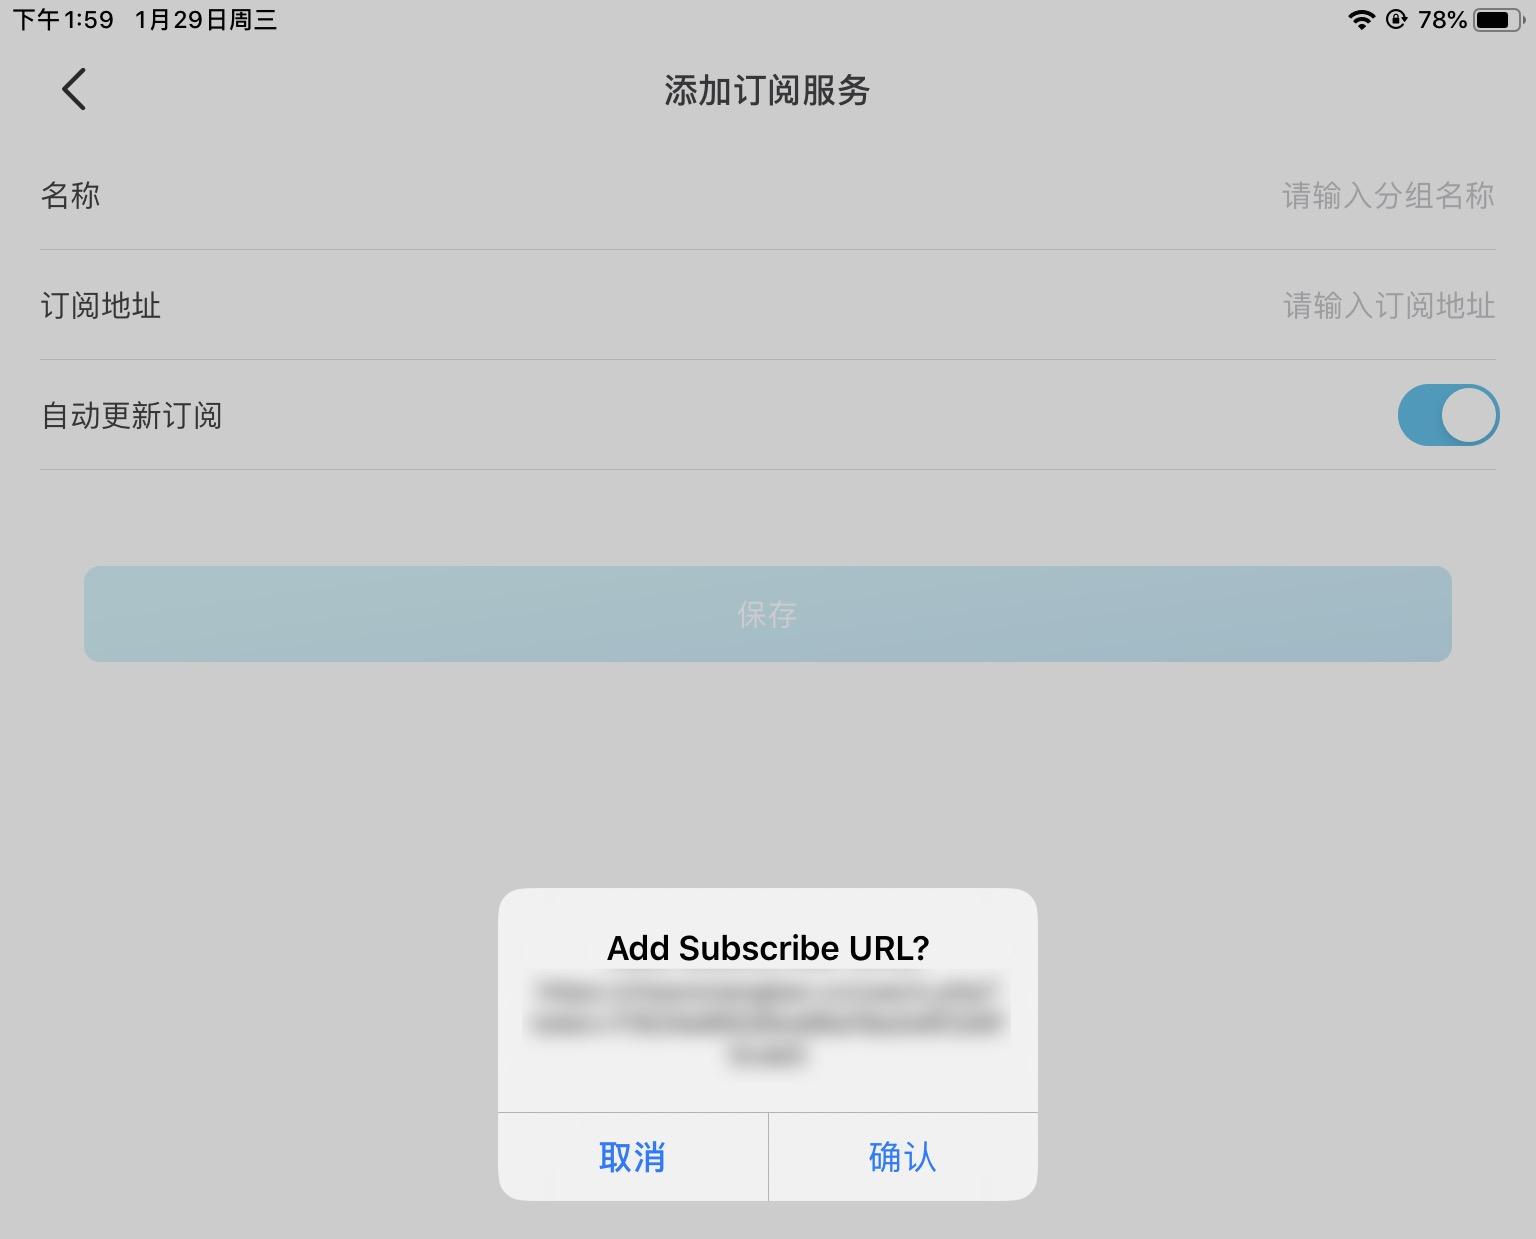 Pharos Pro(水滴)苹果ID下载及使用教程(稀有IOS Trojan节点客户端)